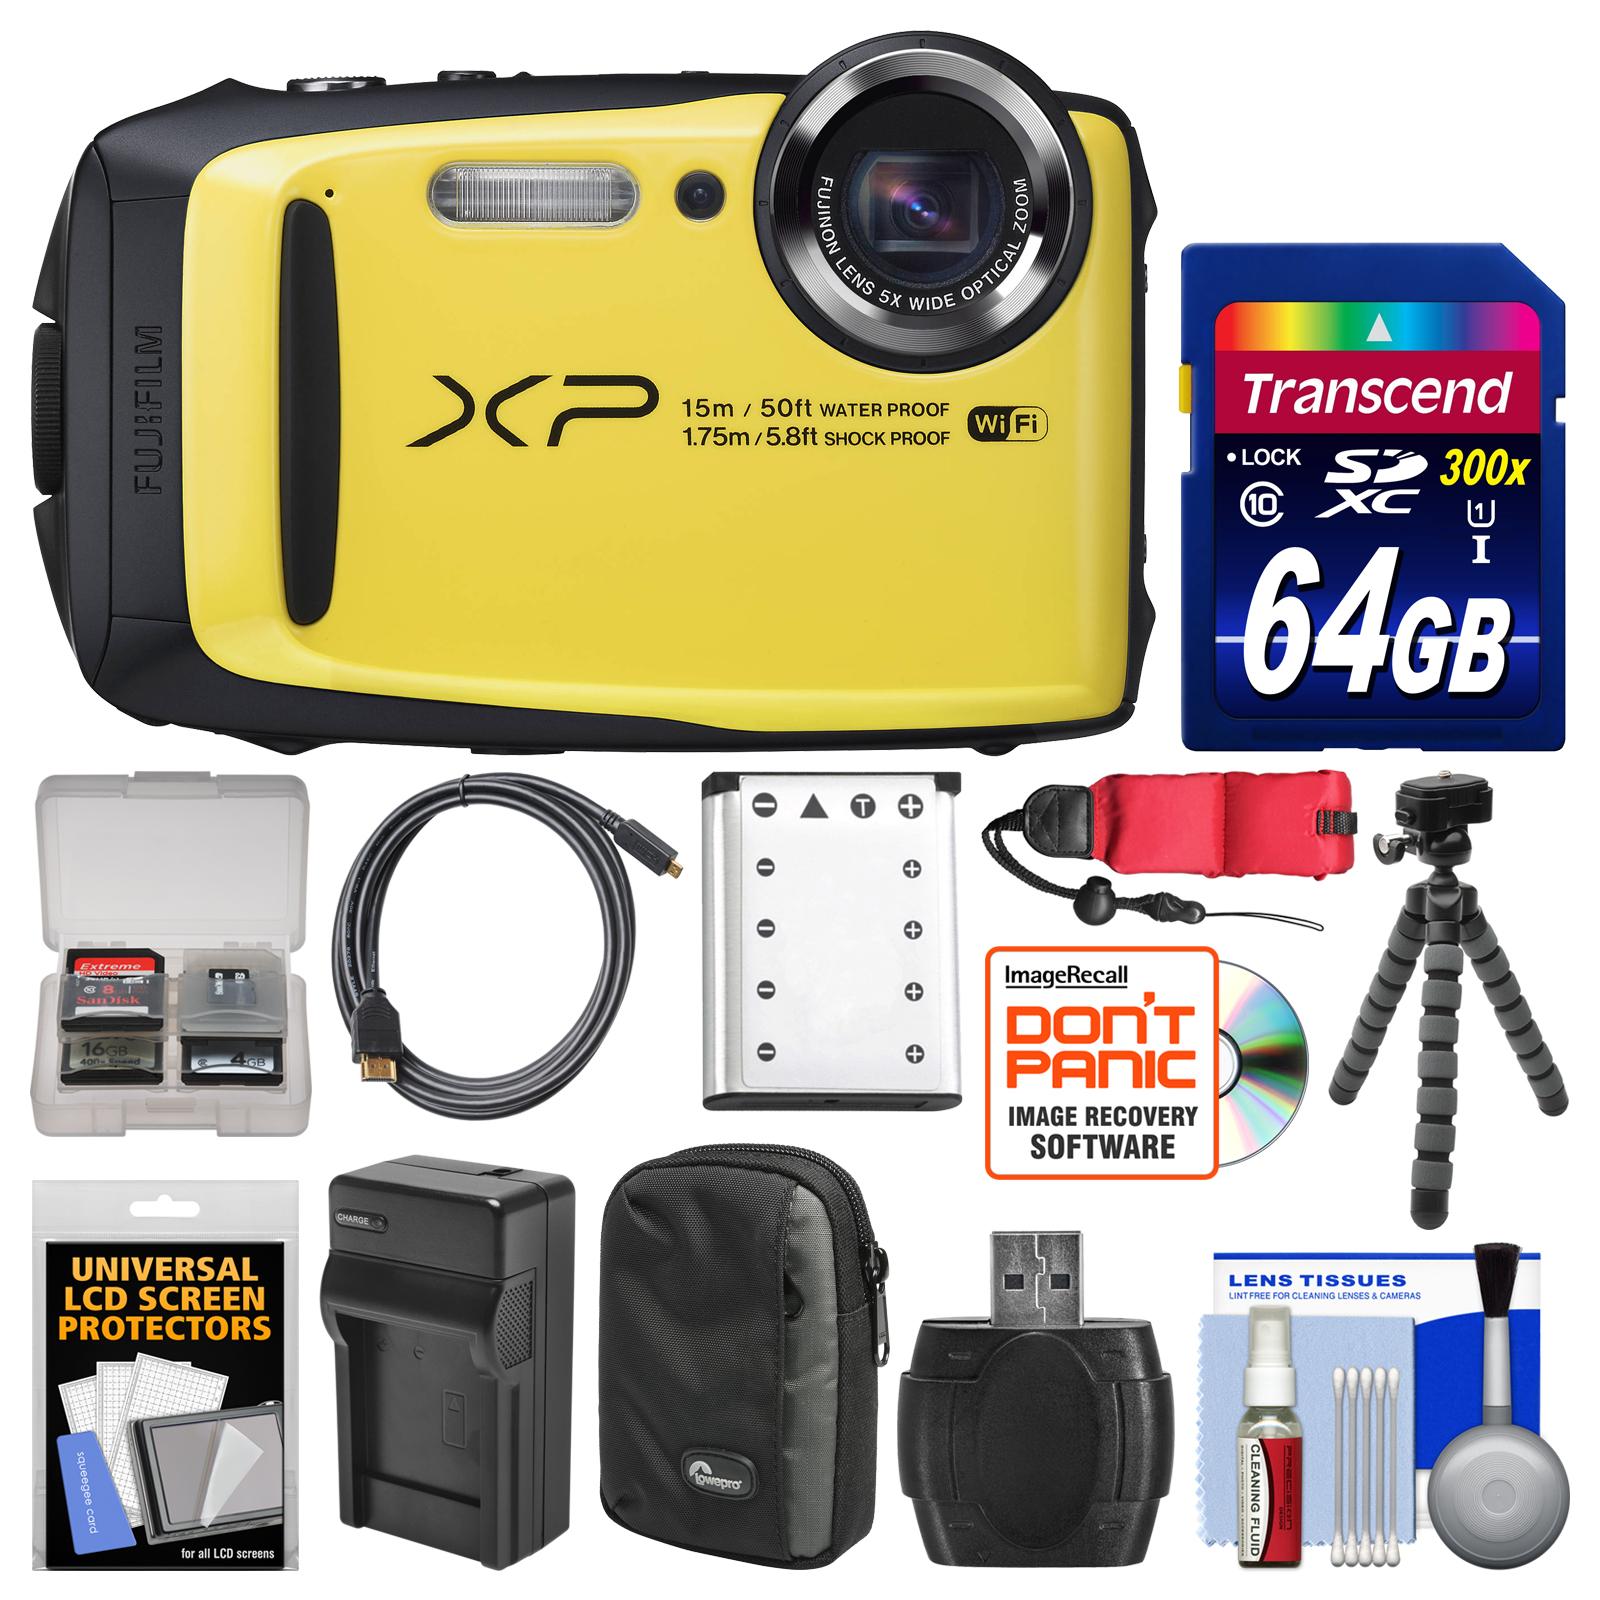 Fujifilm FinePix XP90 Shock & Waterproof Wi-Fi Digital Camera (Yellow) with 64GB Card + Case + Battery & Charger + Flex Tripod + Strap + Kit